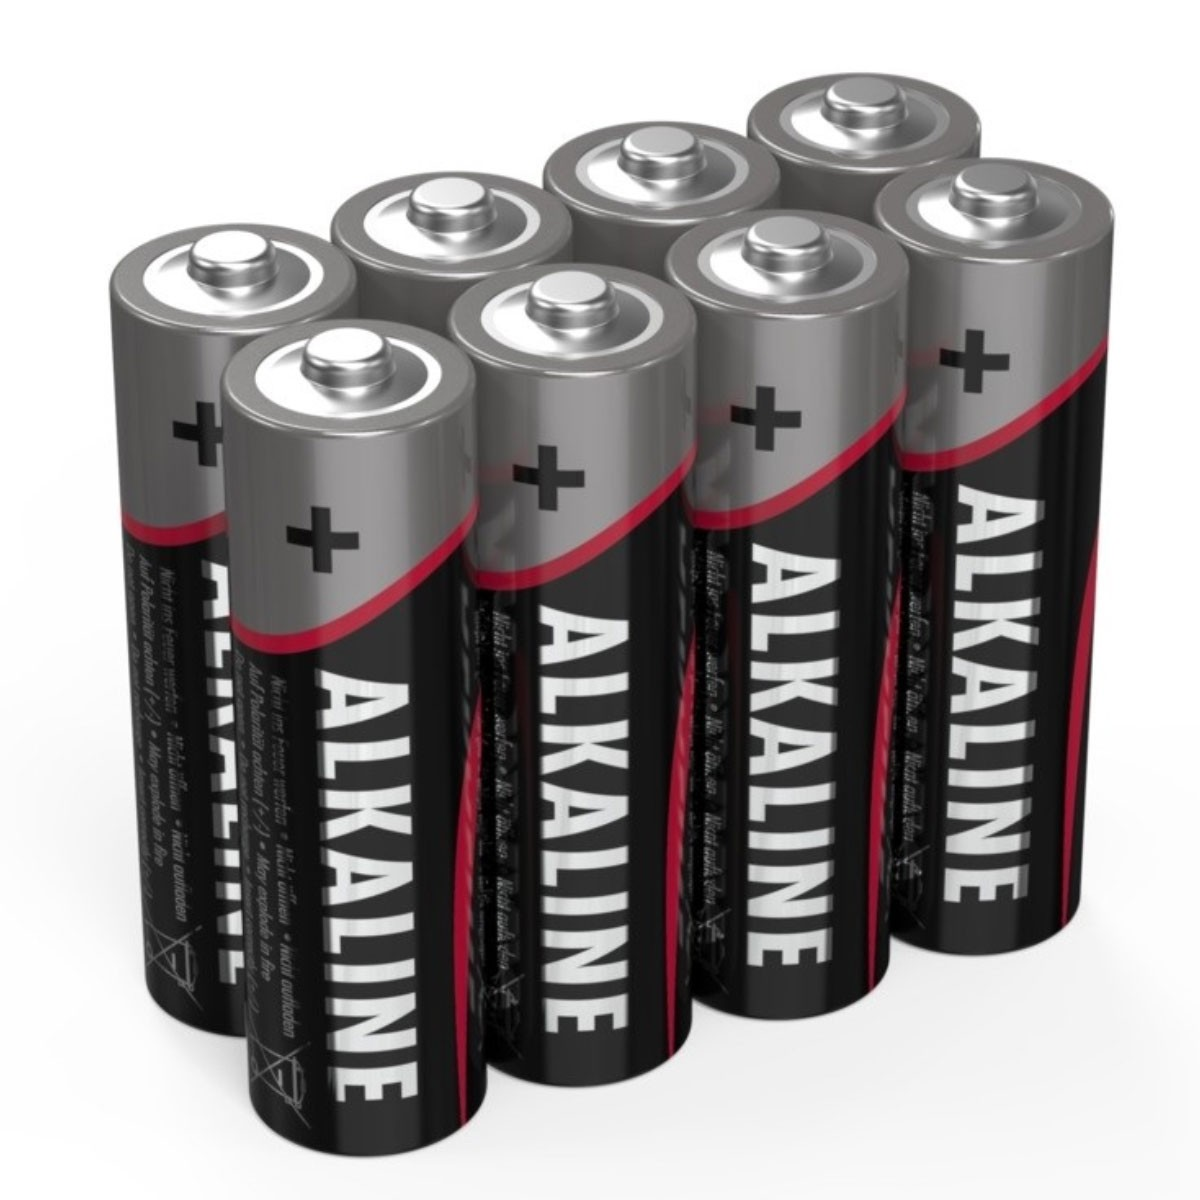 5015280 AA Mignon Batterie LR6 Alkaline 1.5 Volt 8 Stück